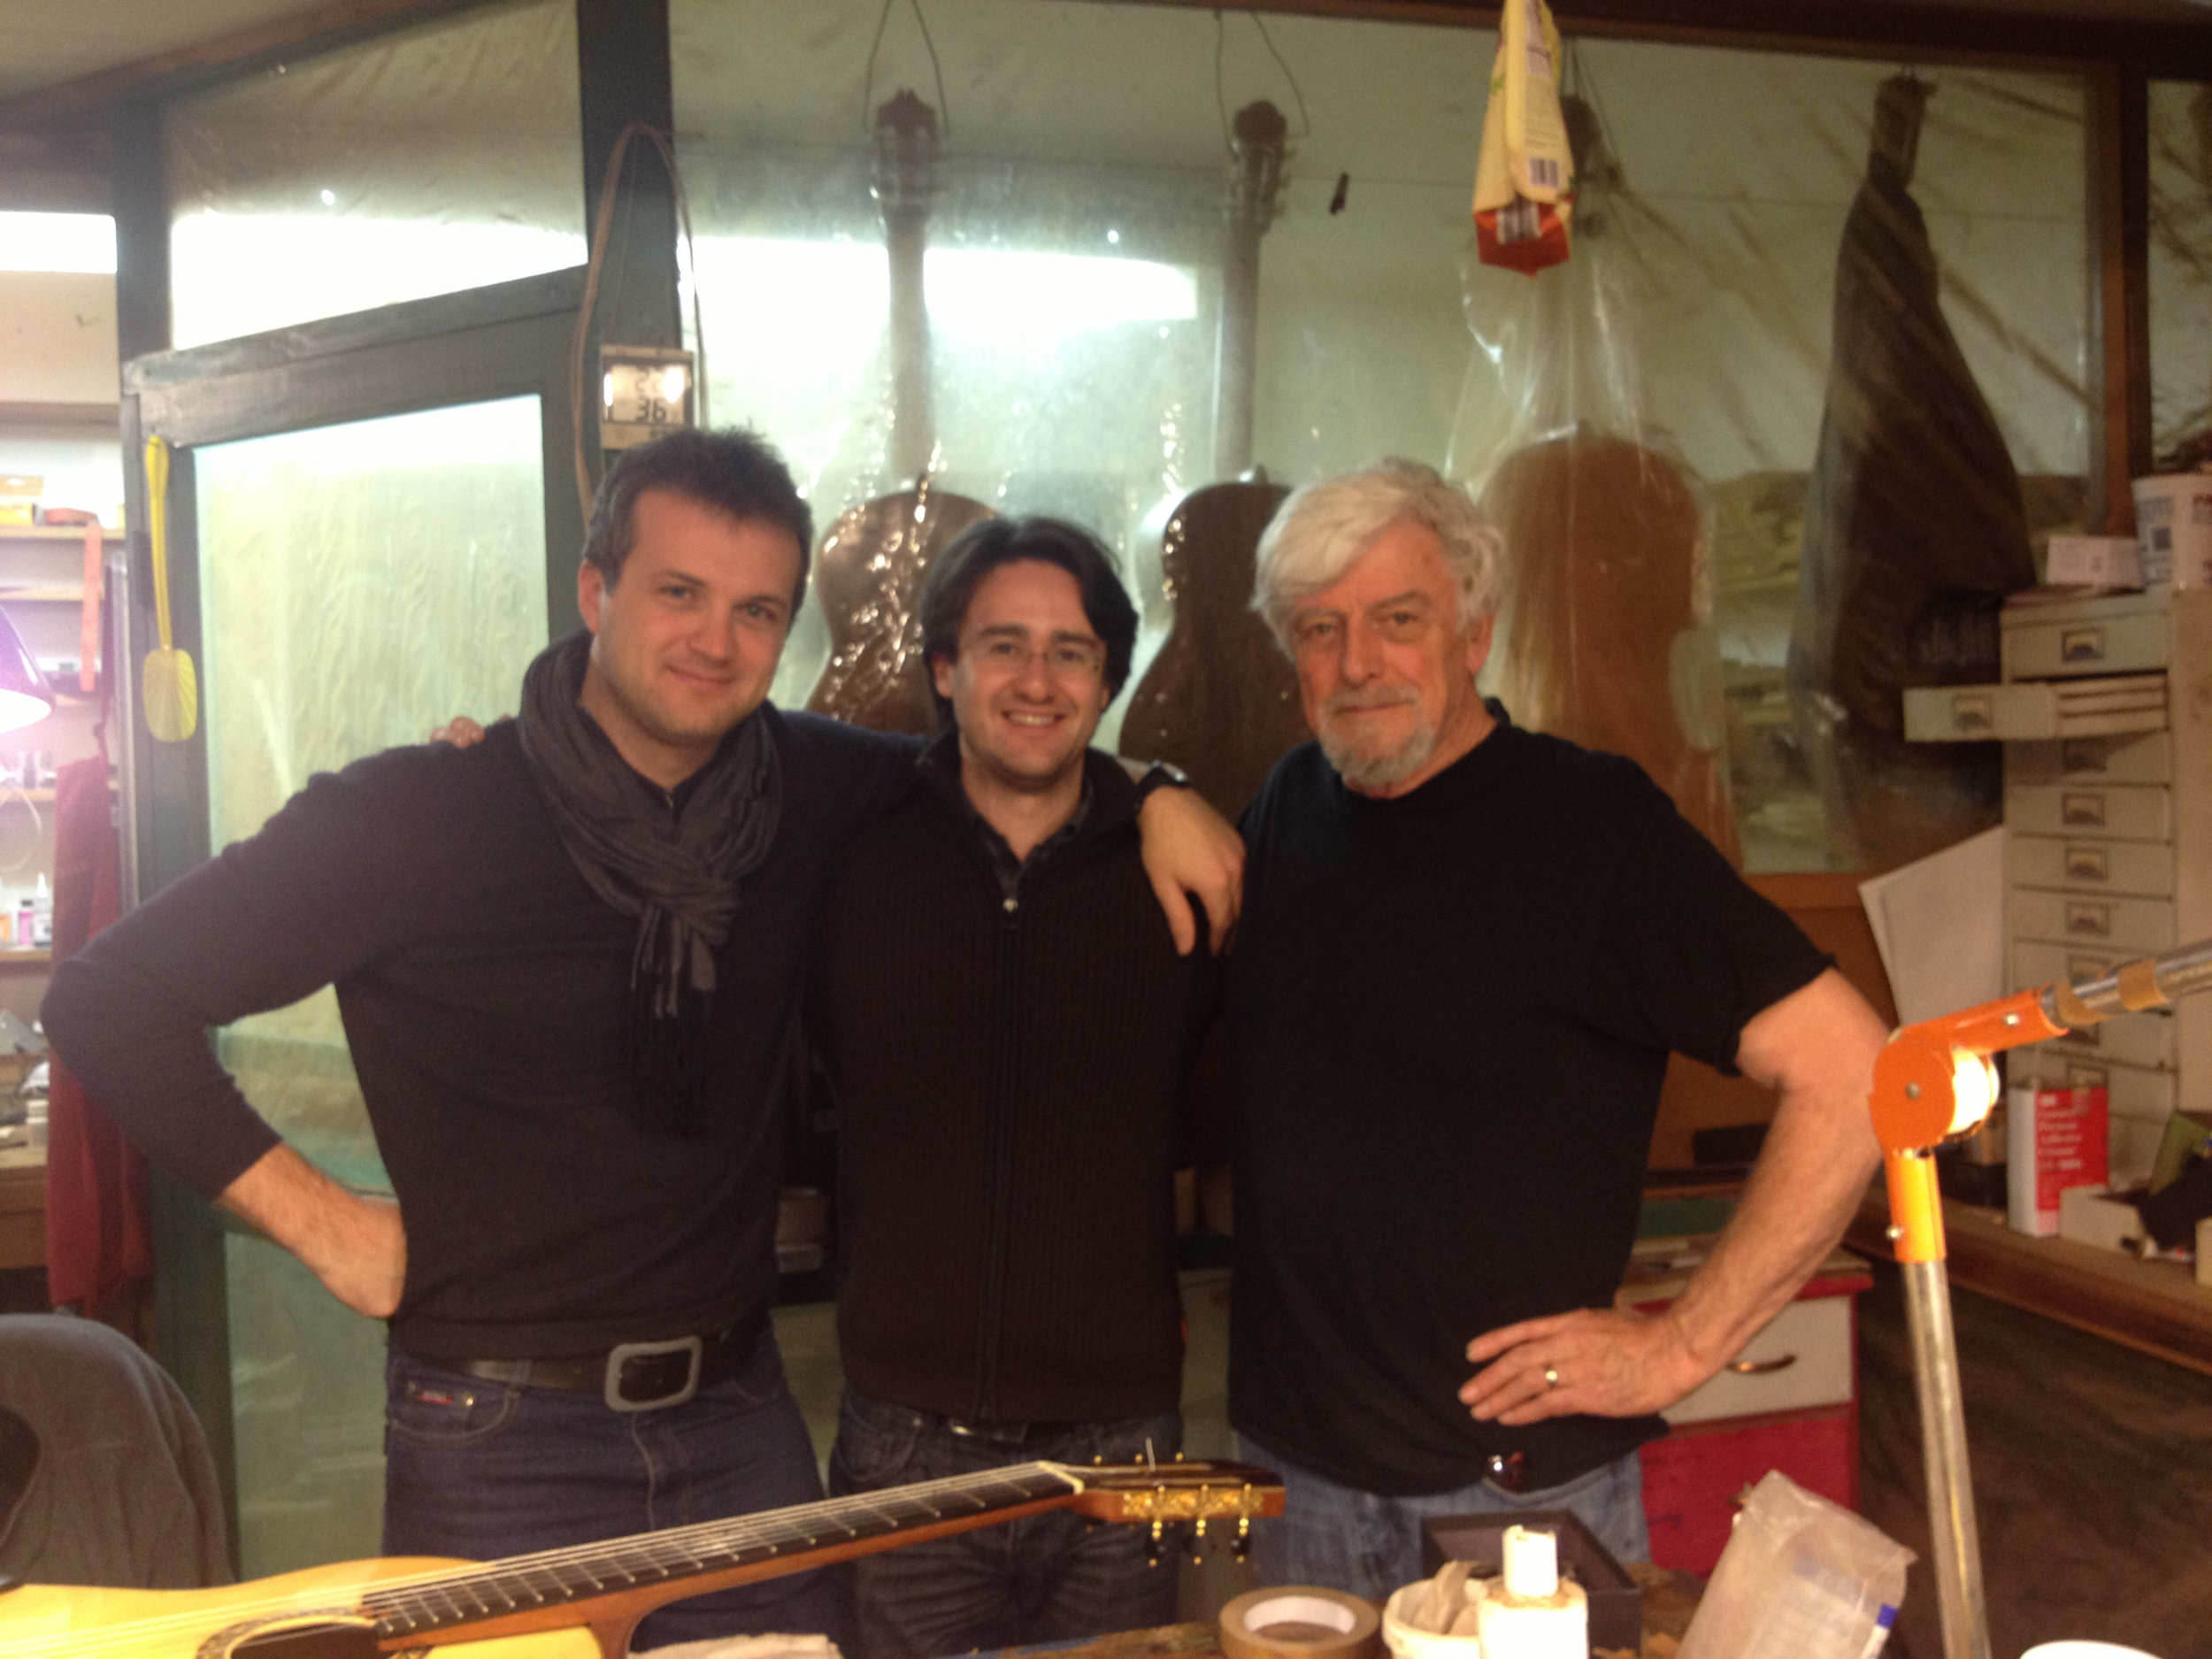 With Vladimir Gorbach and Gil Carnal